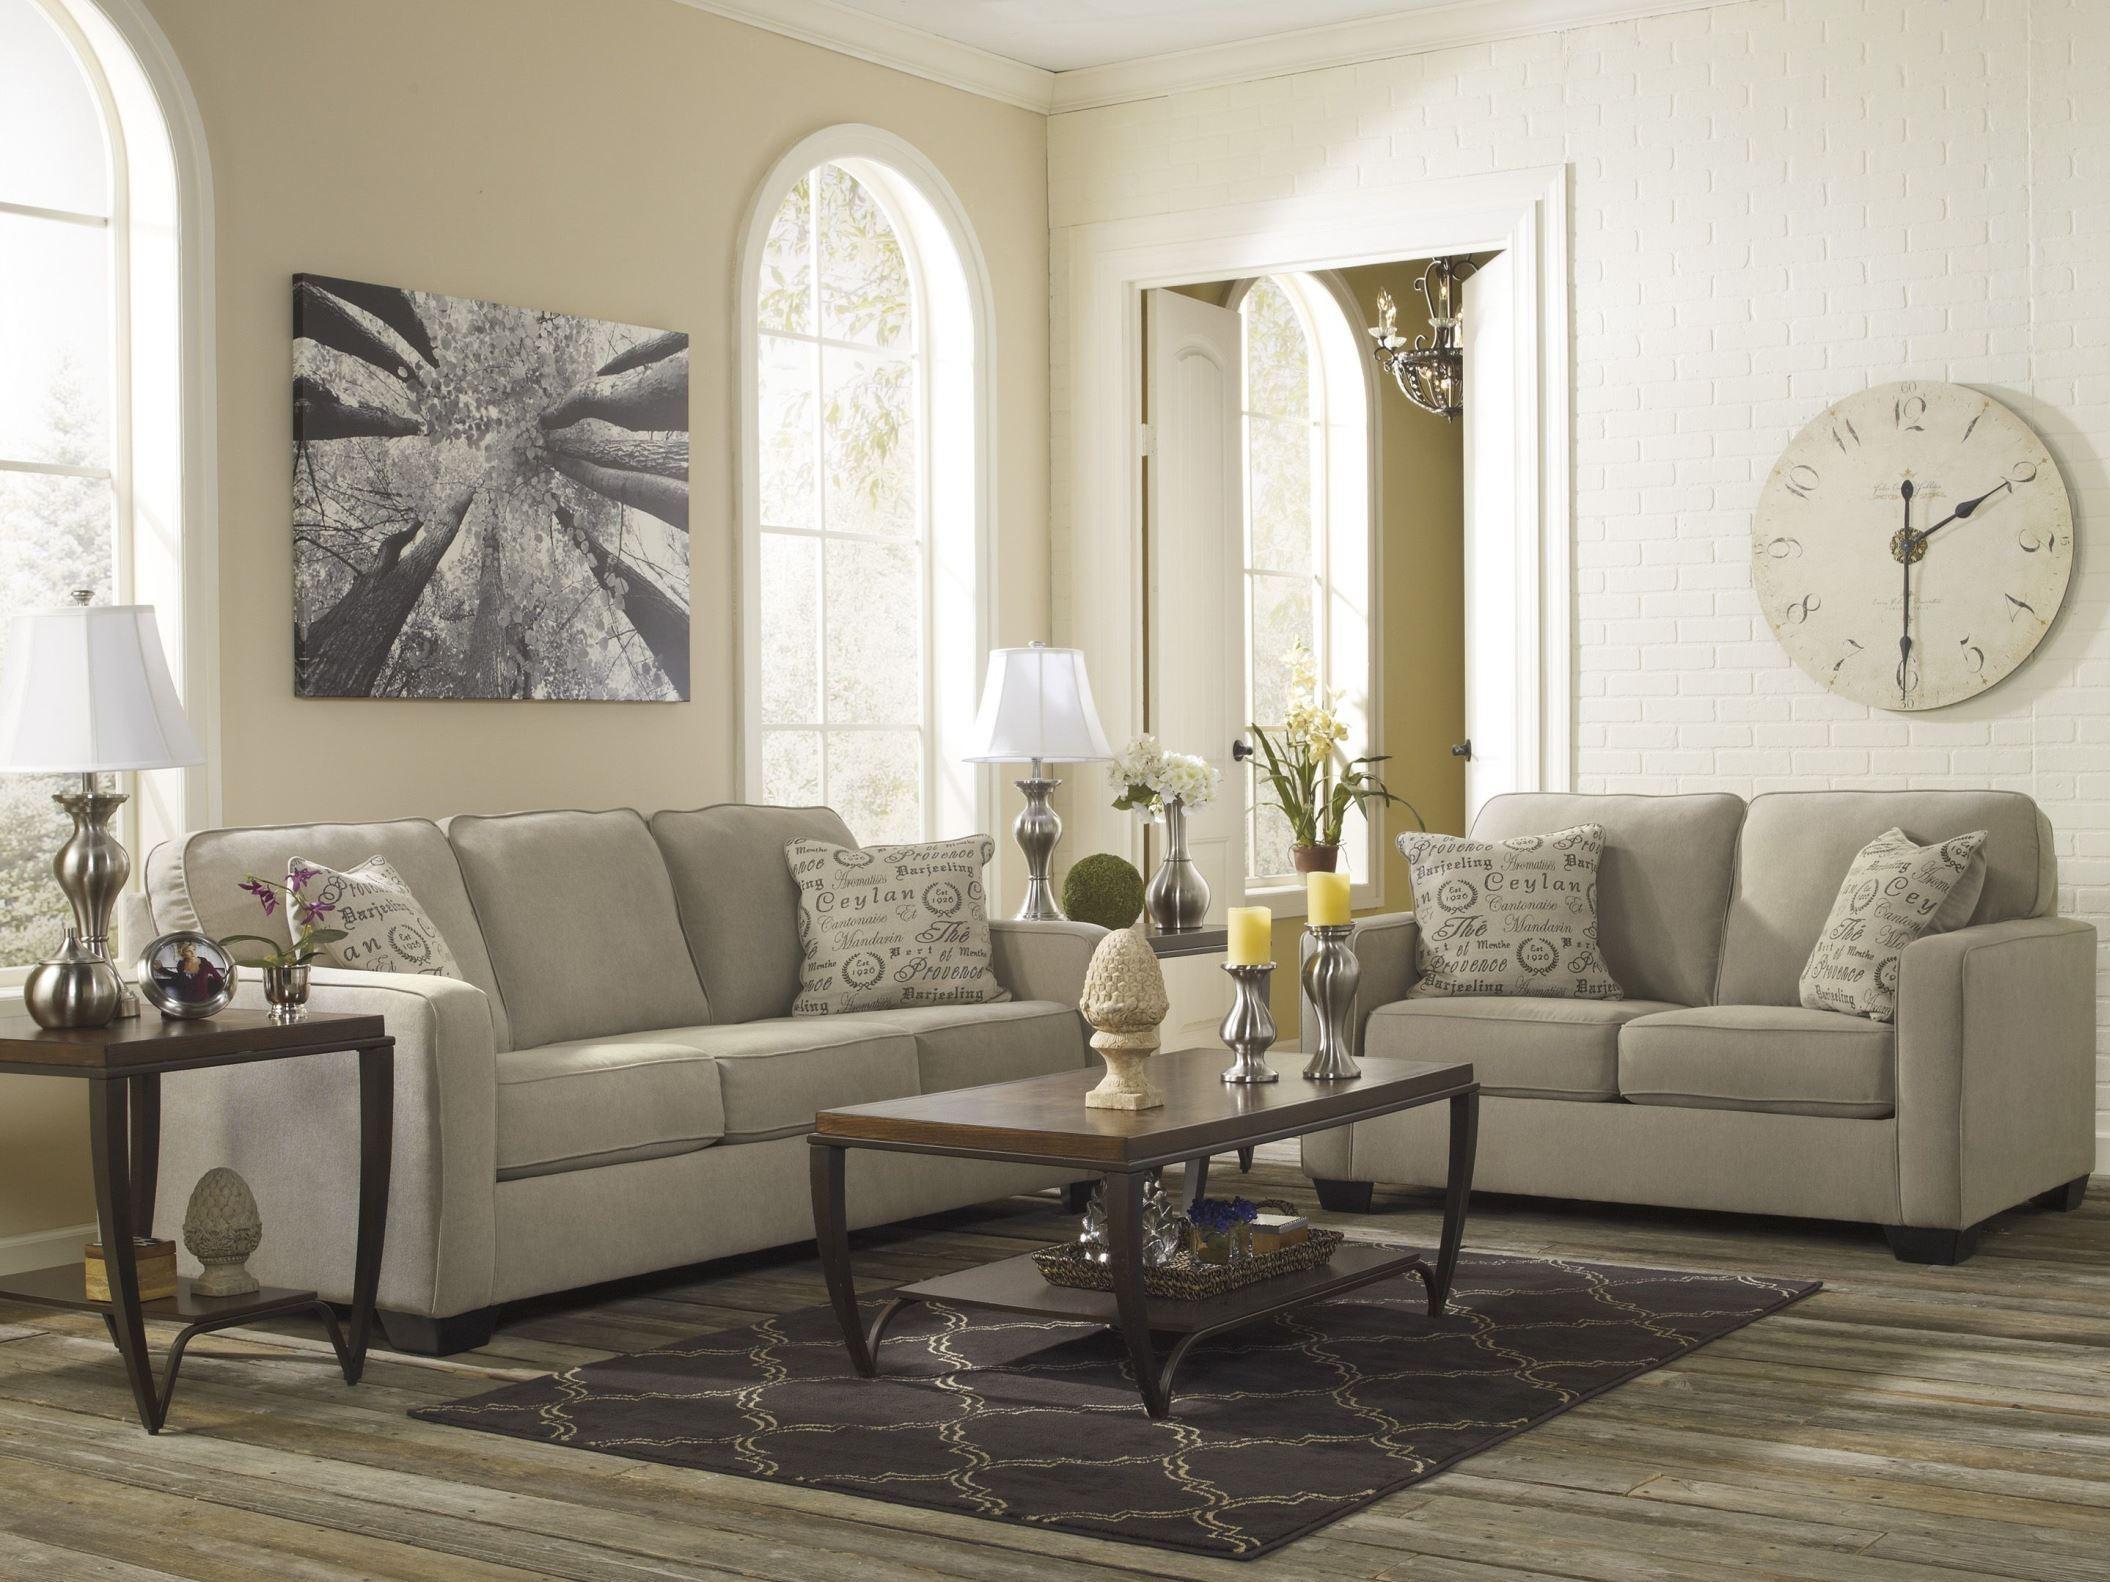 Alenya Quartz Living Room Set From Ashley 16600 38 35